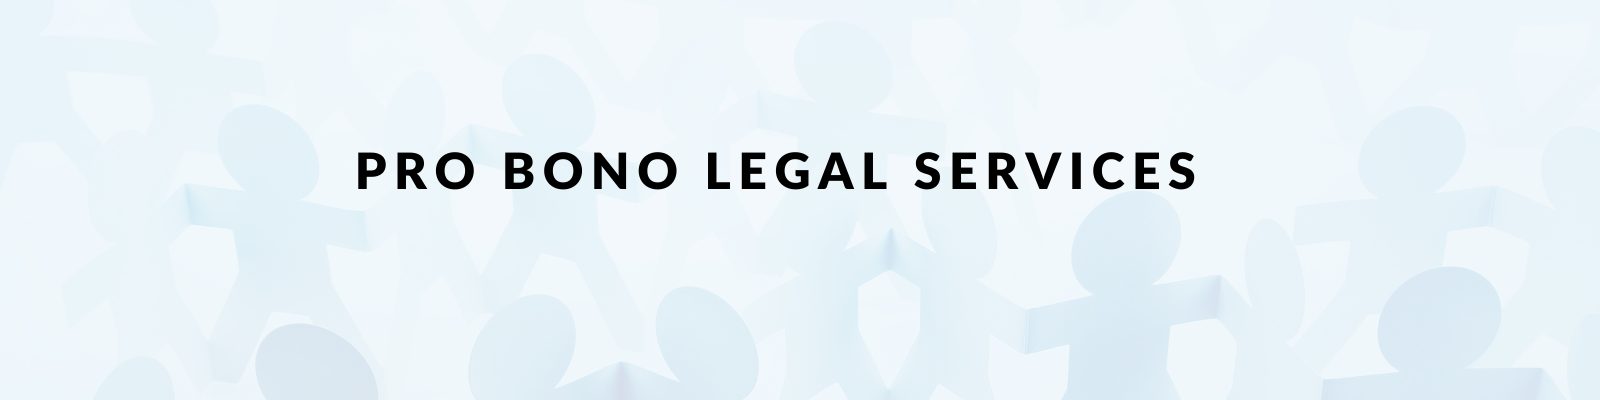 Ivy Law Group Pro bono legal services